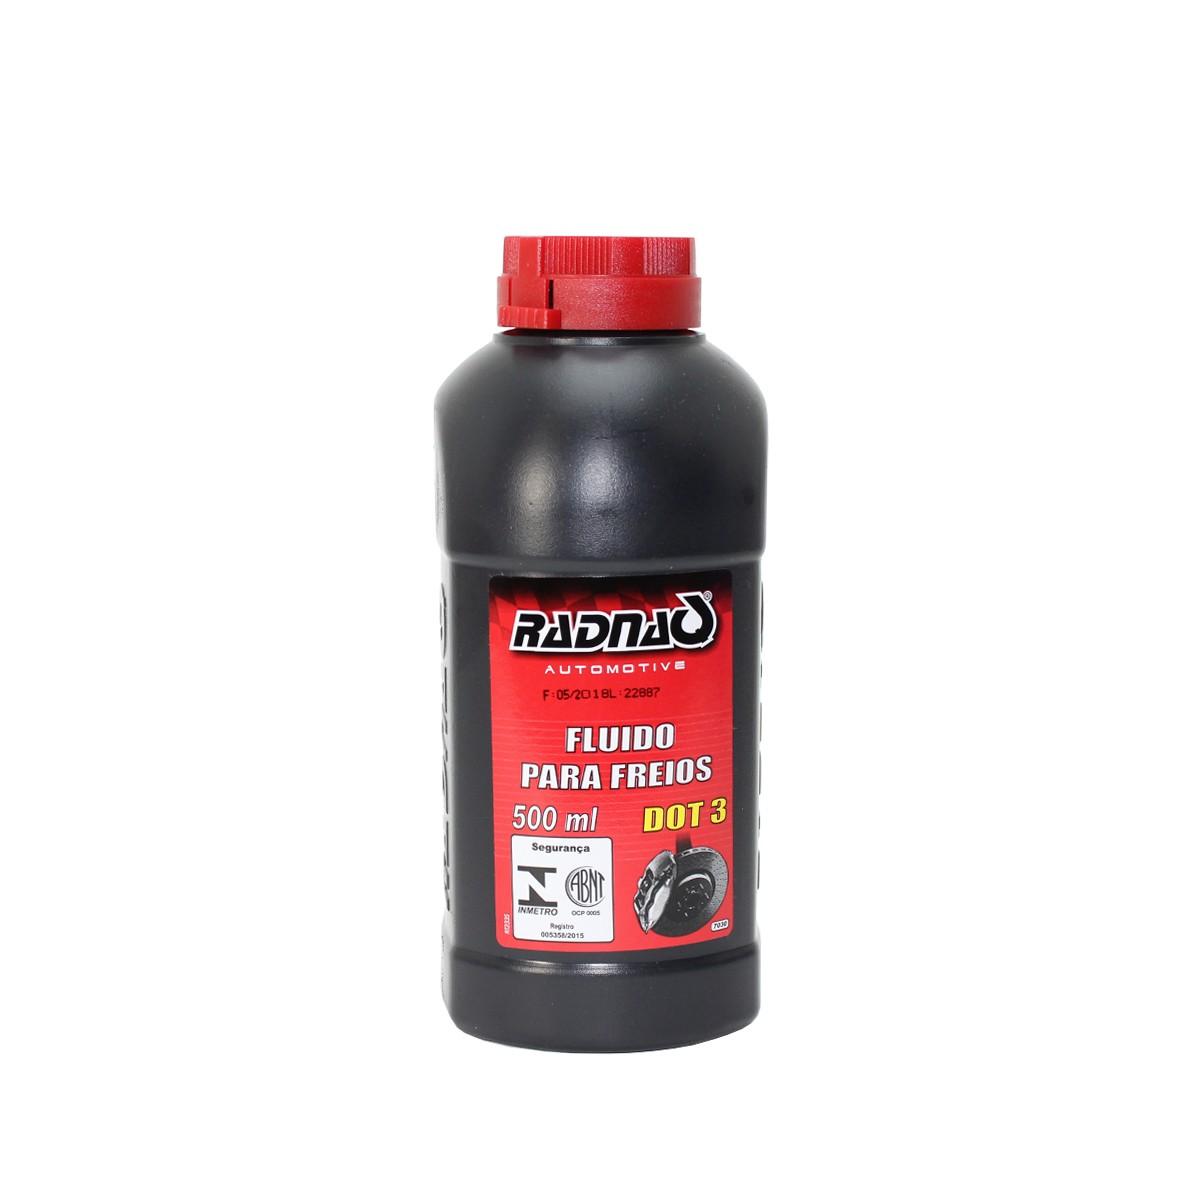 Fluido para Freios DOT3 500ml - RADNAQ